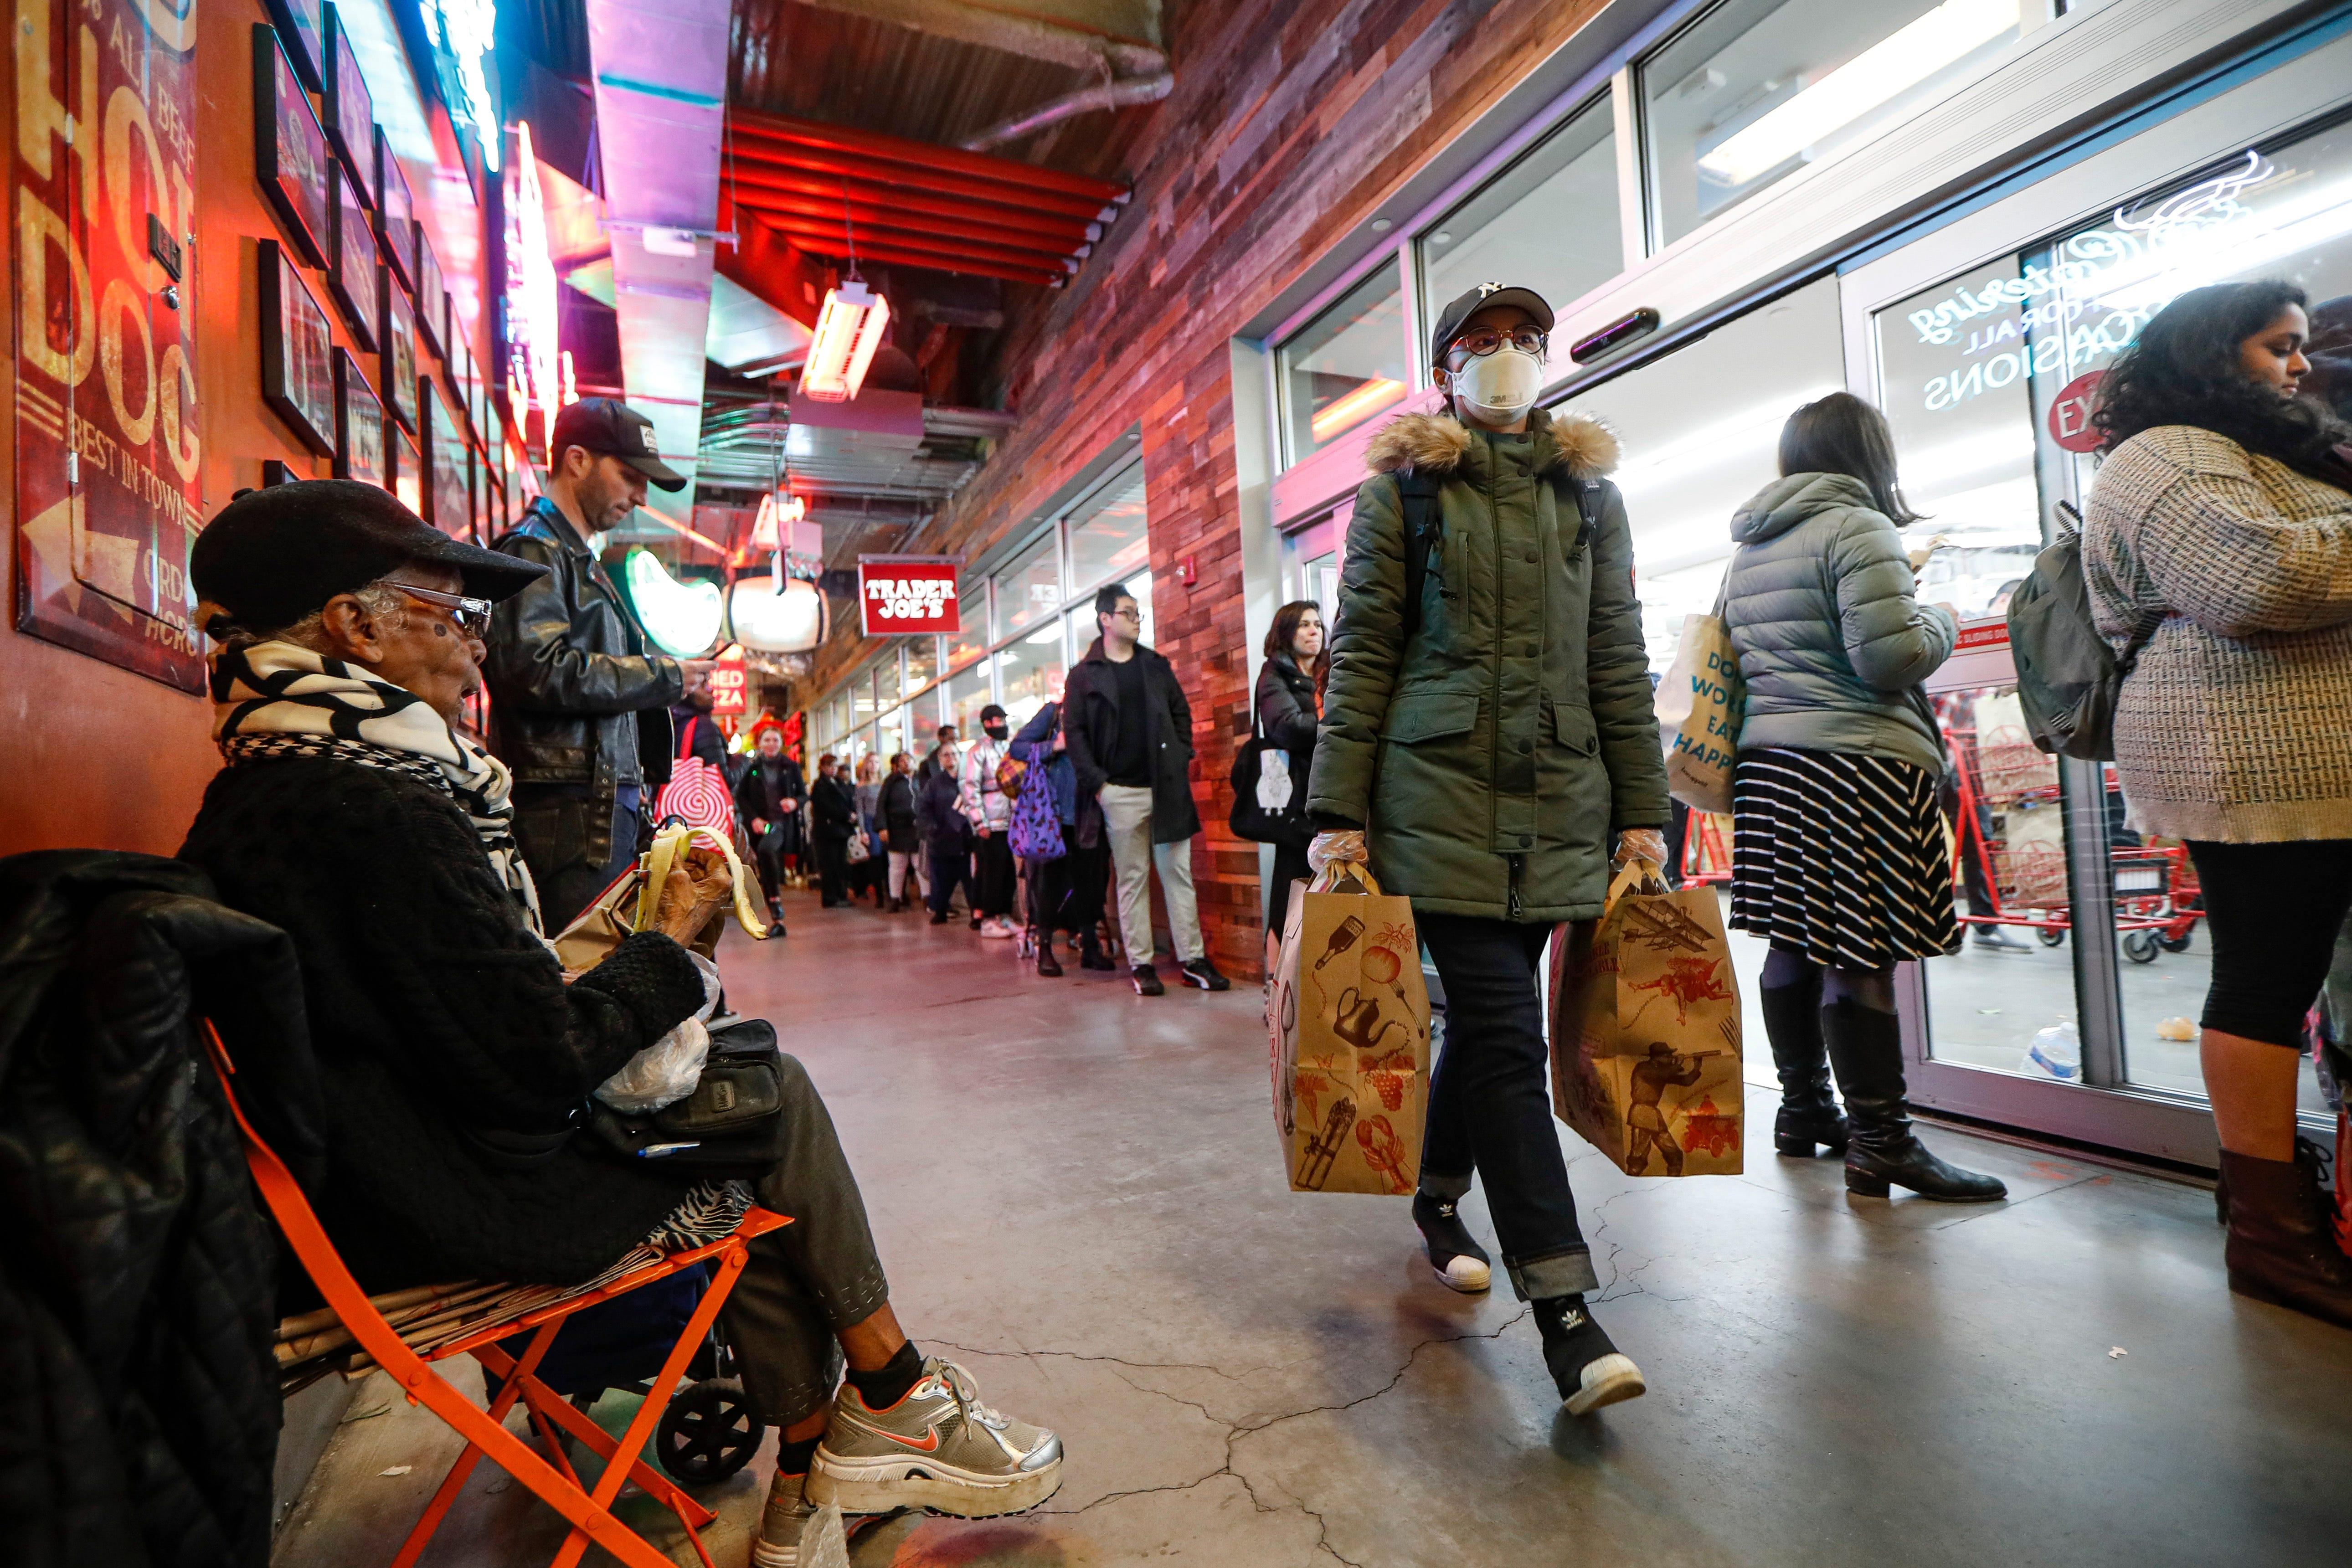 Trader Joe s and Walgreens add senior shopping hours